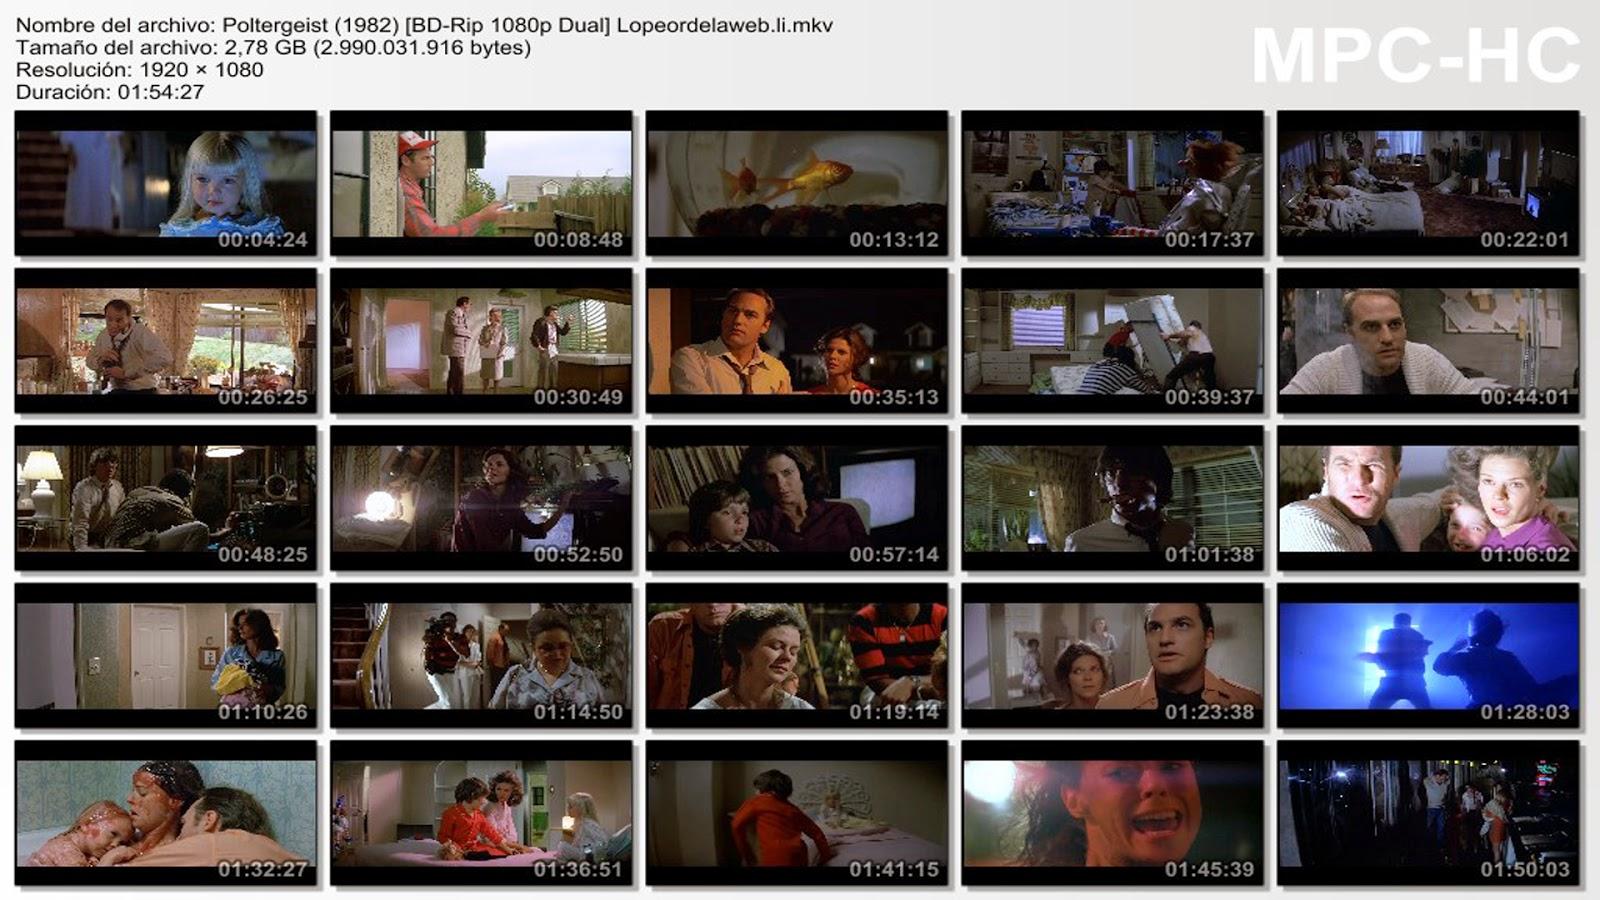 Poltergeist |1982 |1080p.| Dual |Latino